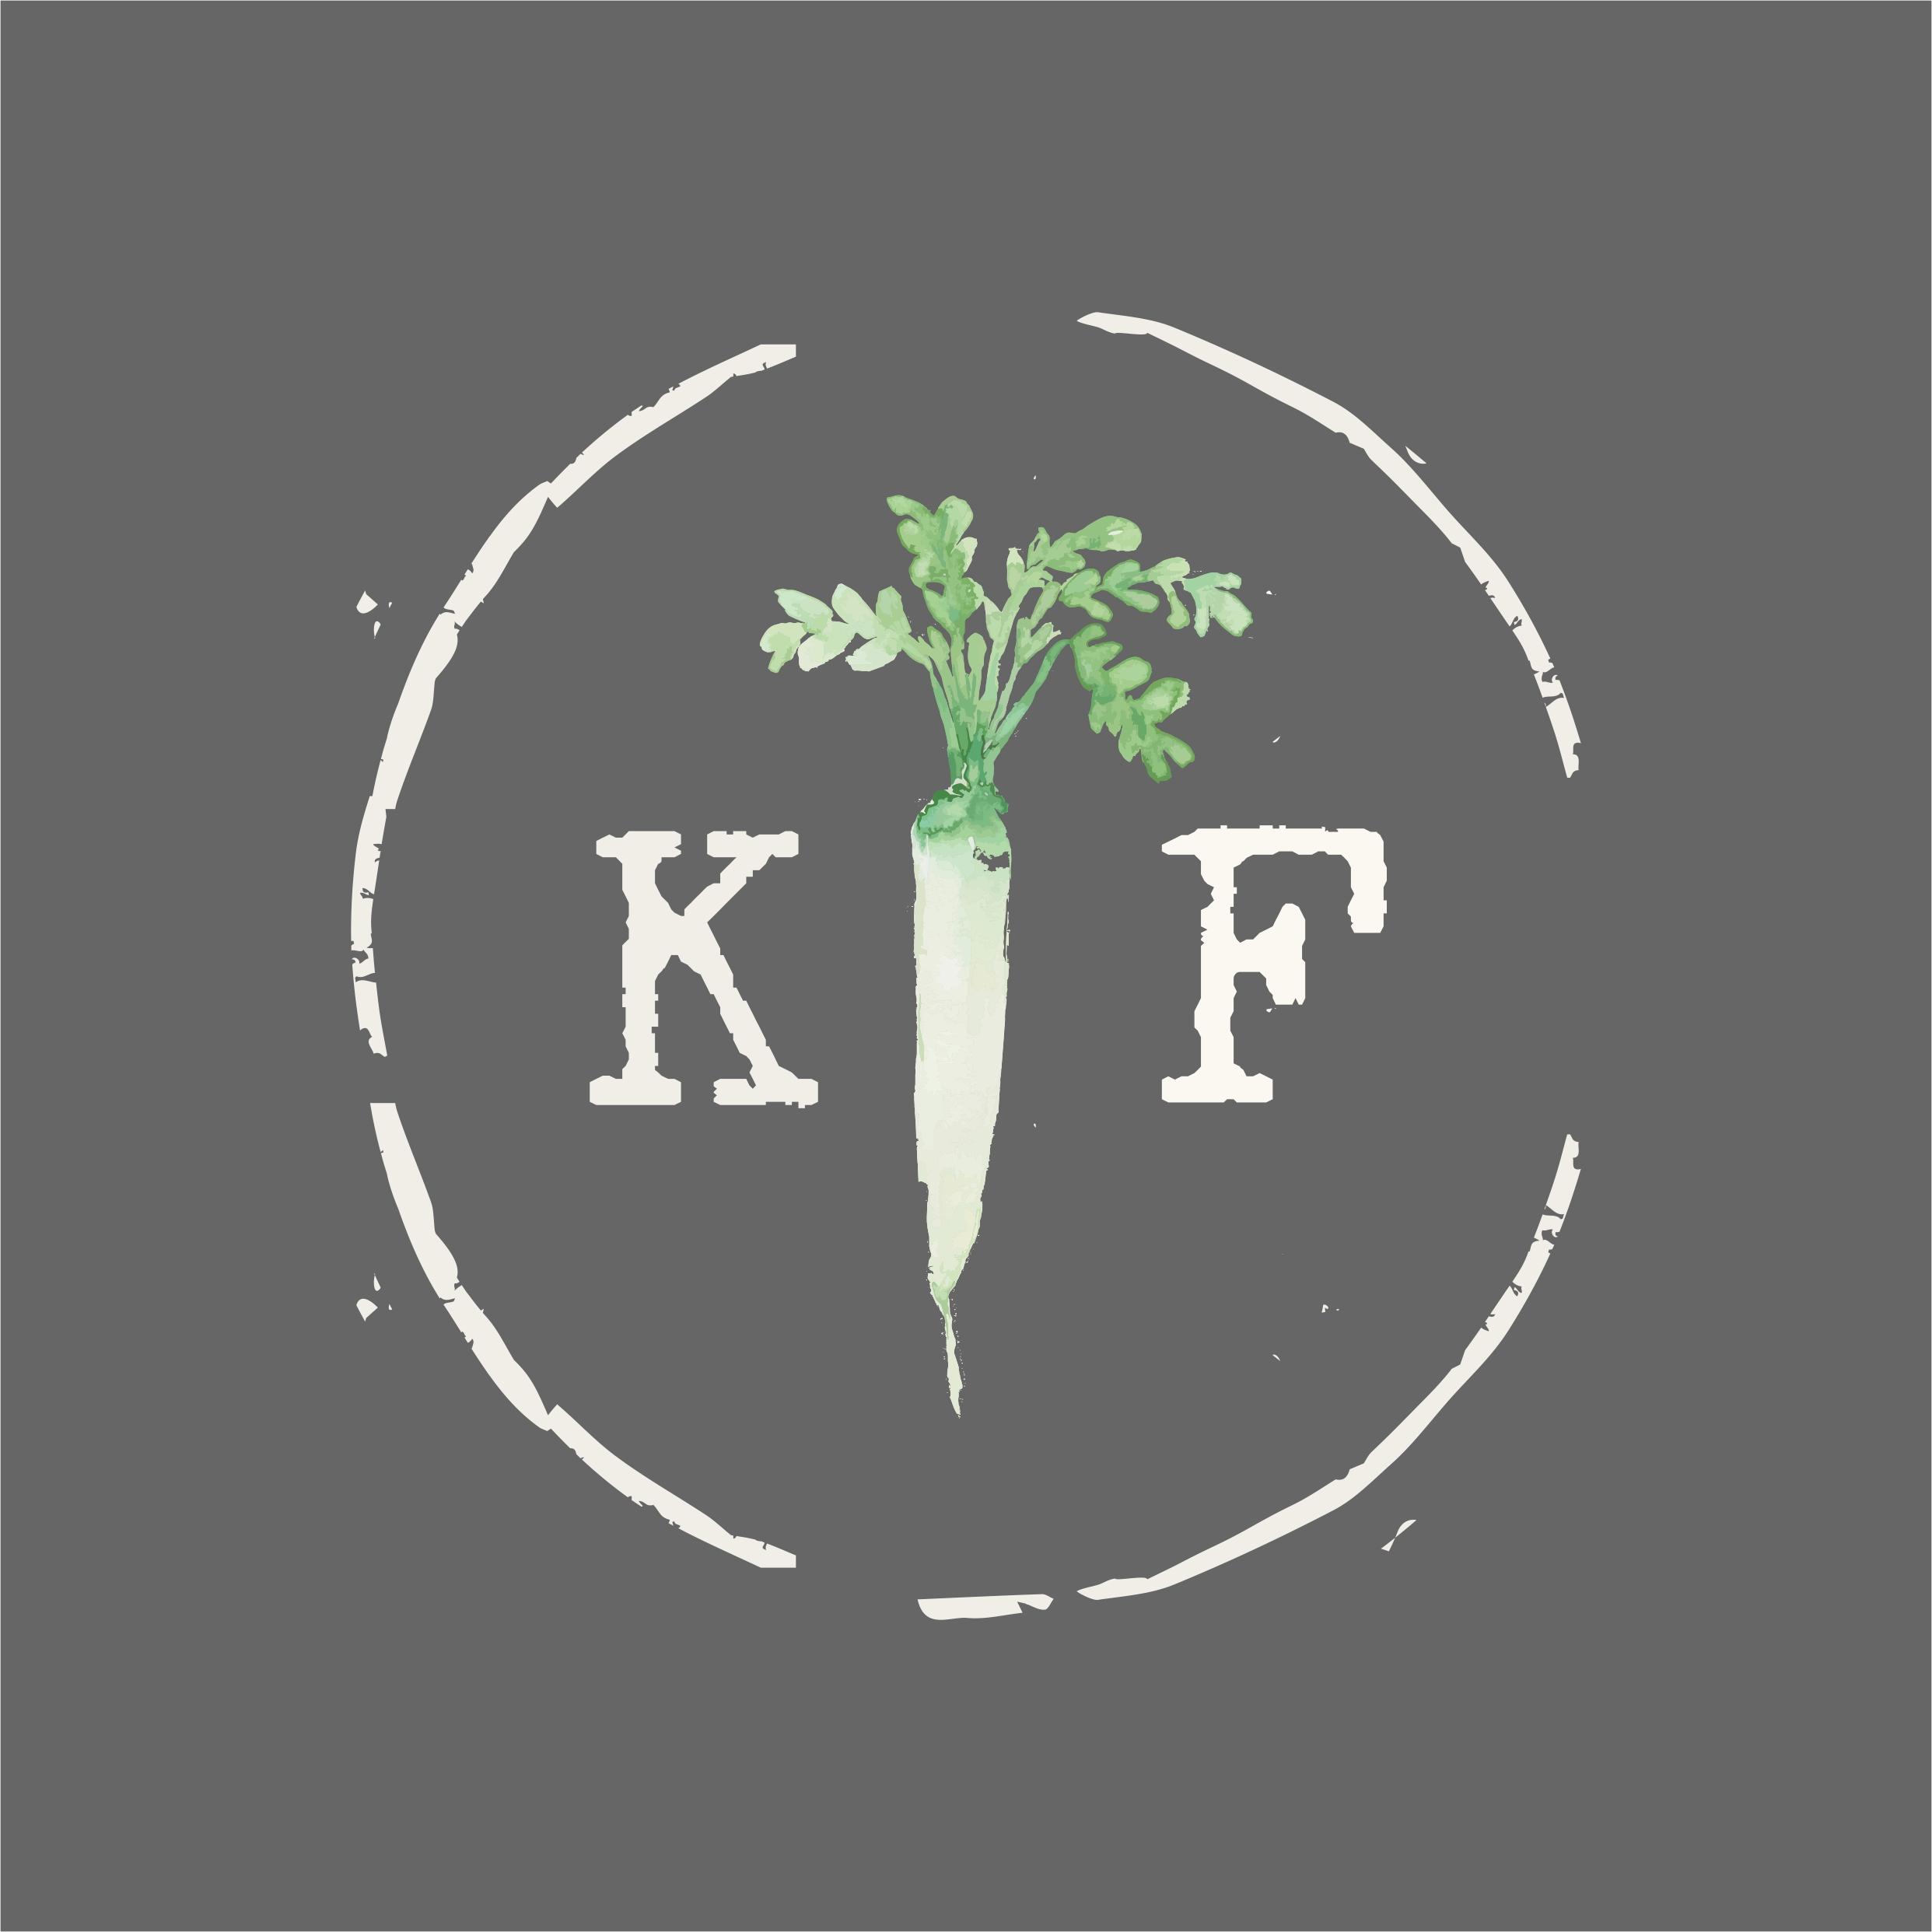 kf_initials.jpg